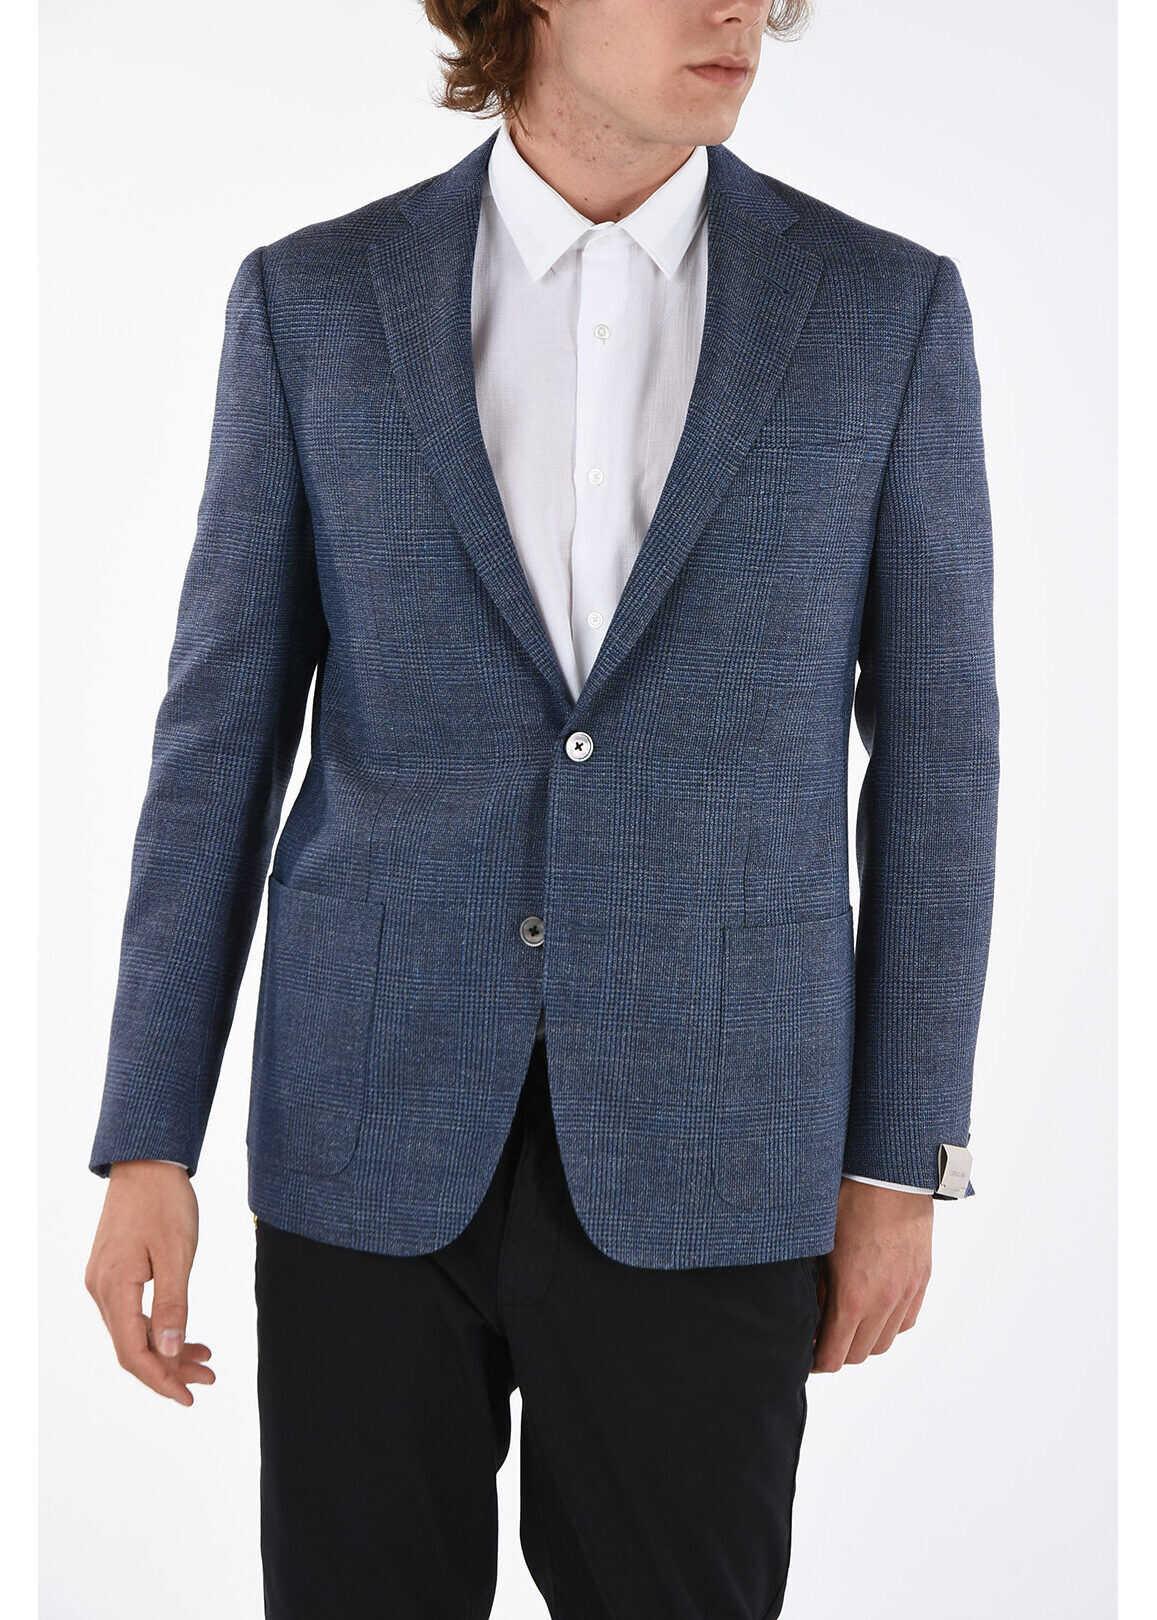 CORNELIANI district check GATE patch pocket 2-button blazer BLUE imagine